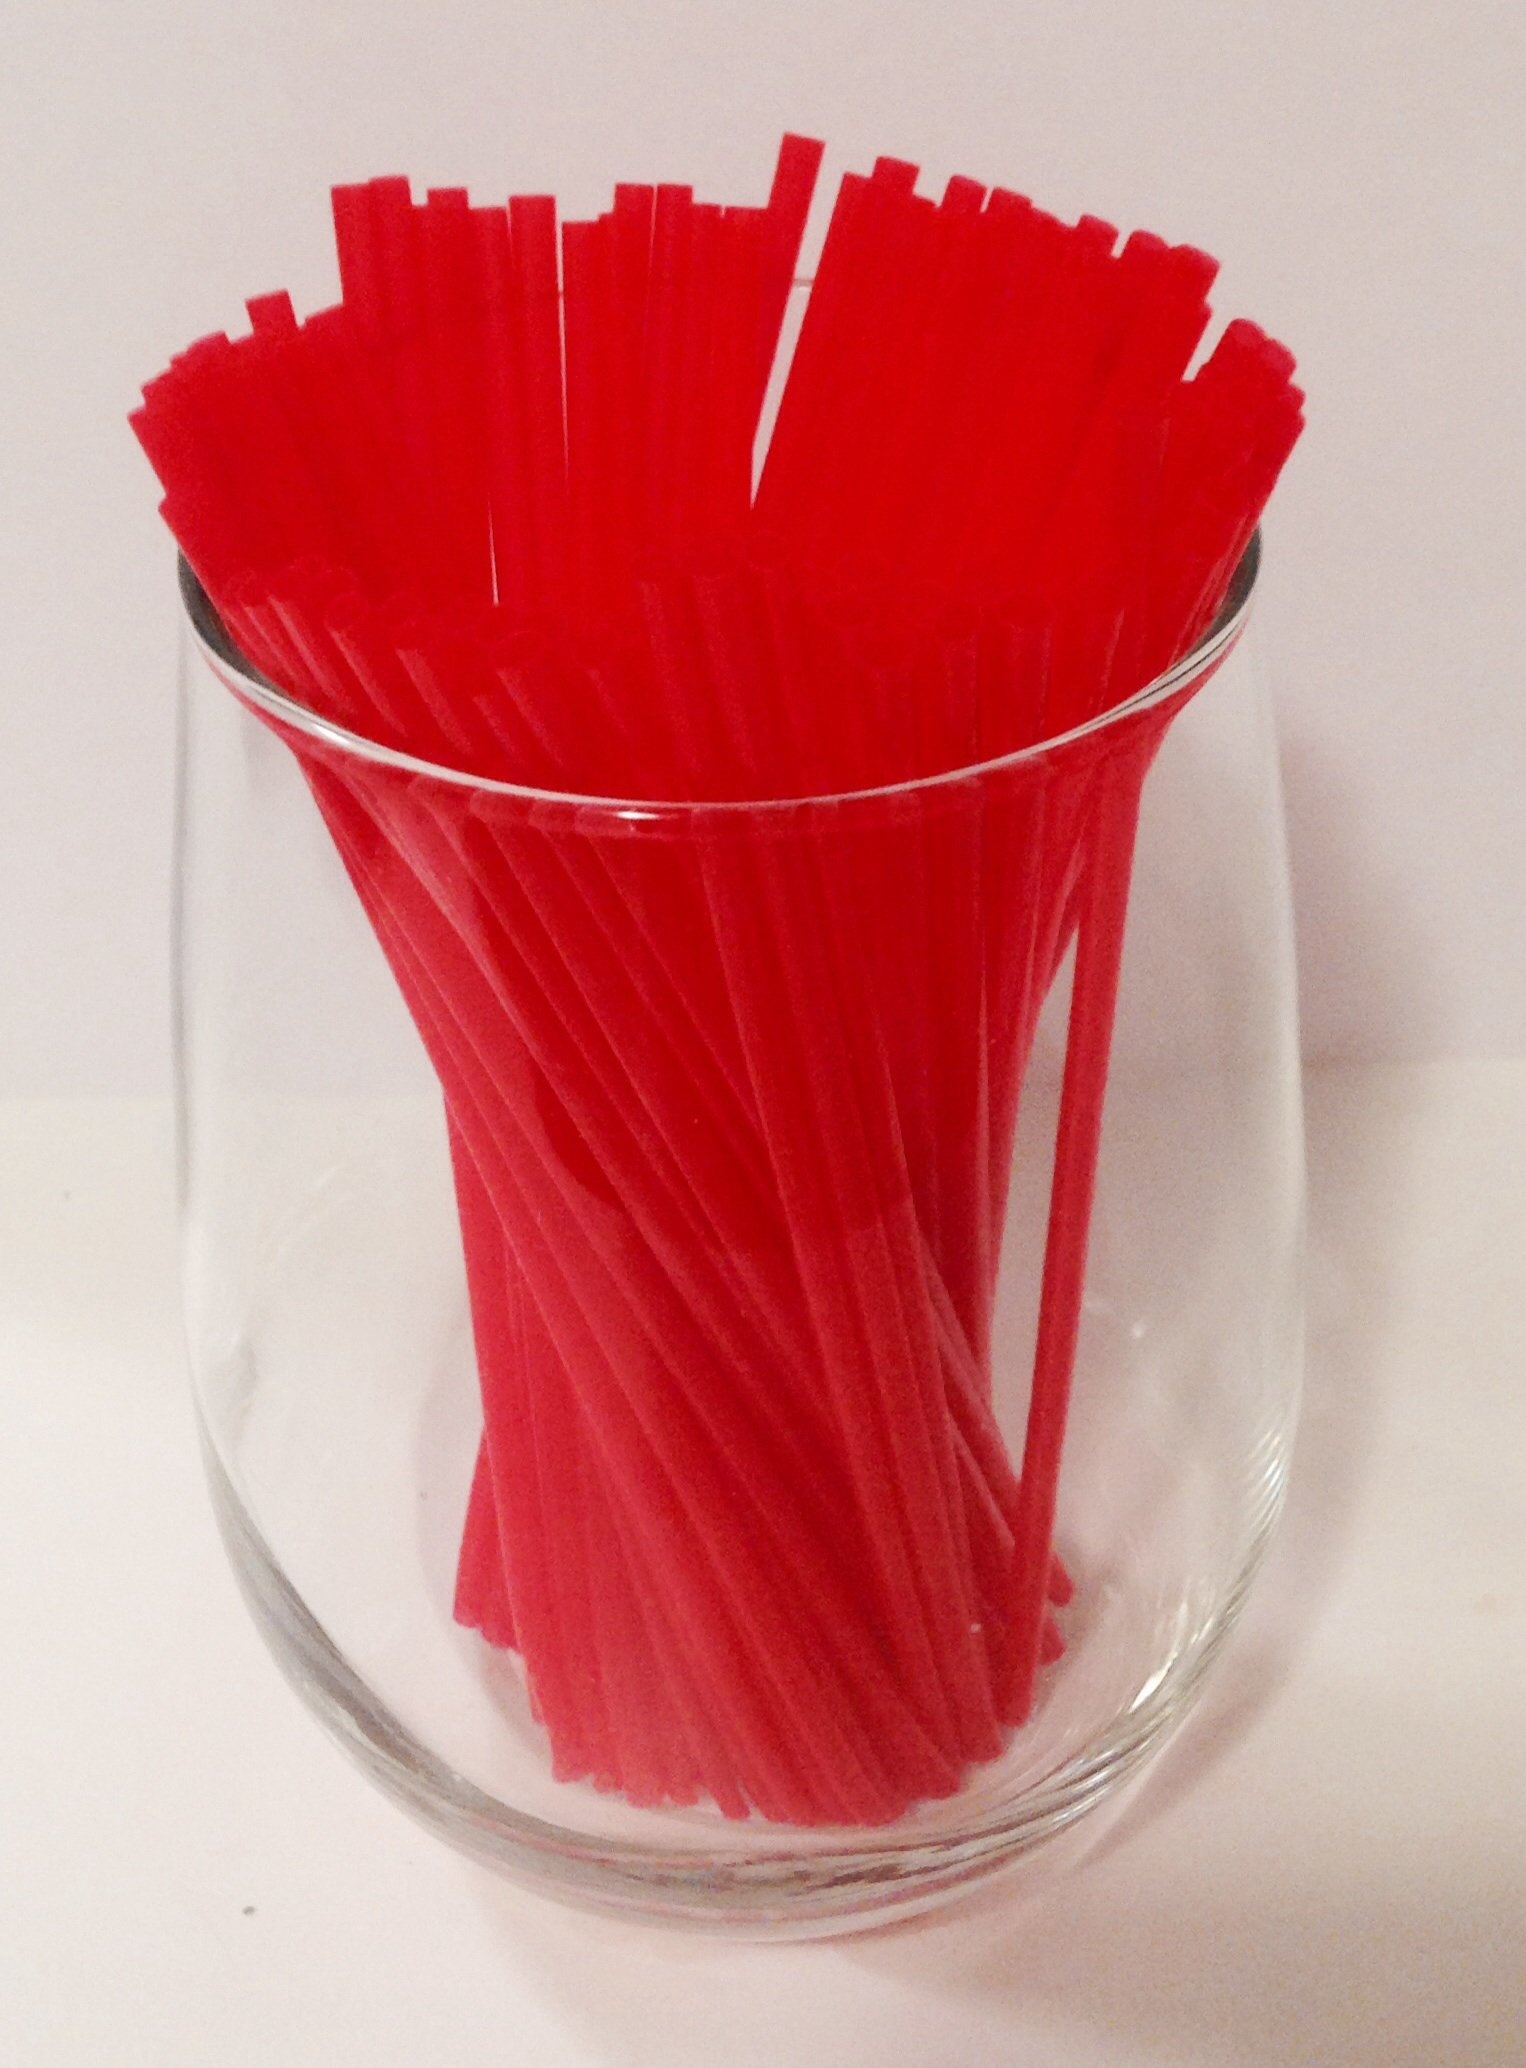 RED Coffee and Cocktail Stirrer Straws 5000 Ct. Beverage Bar Restaurant Deli